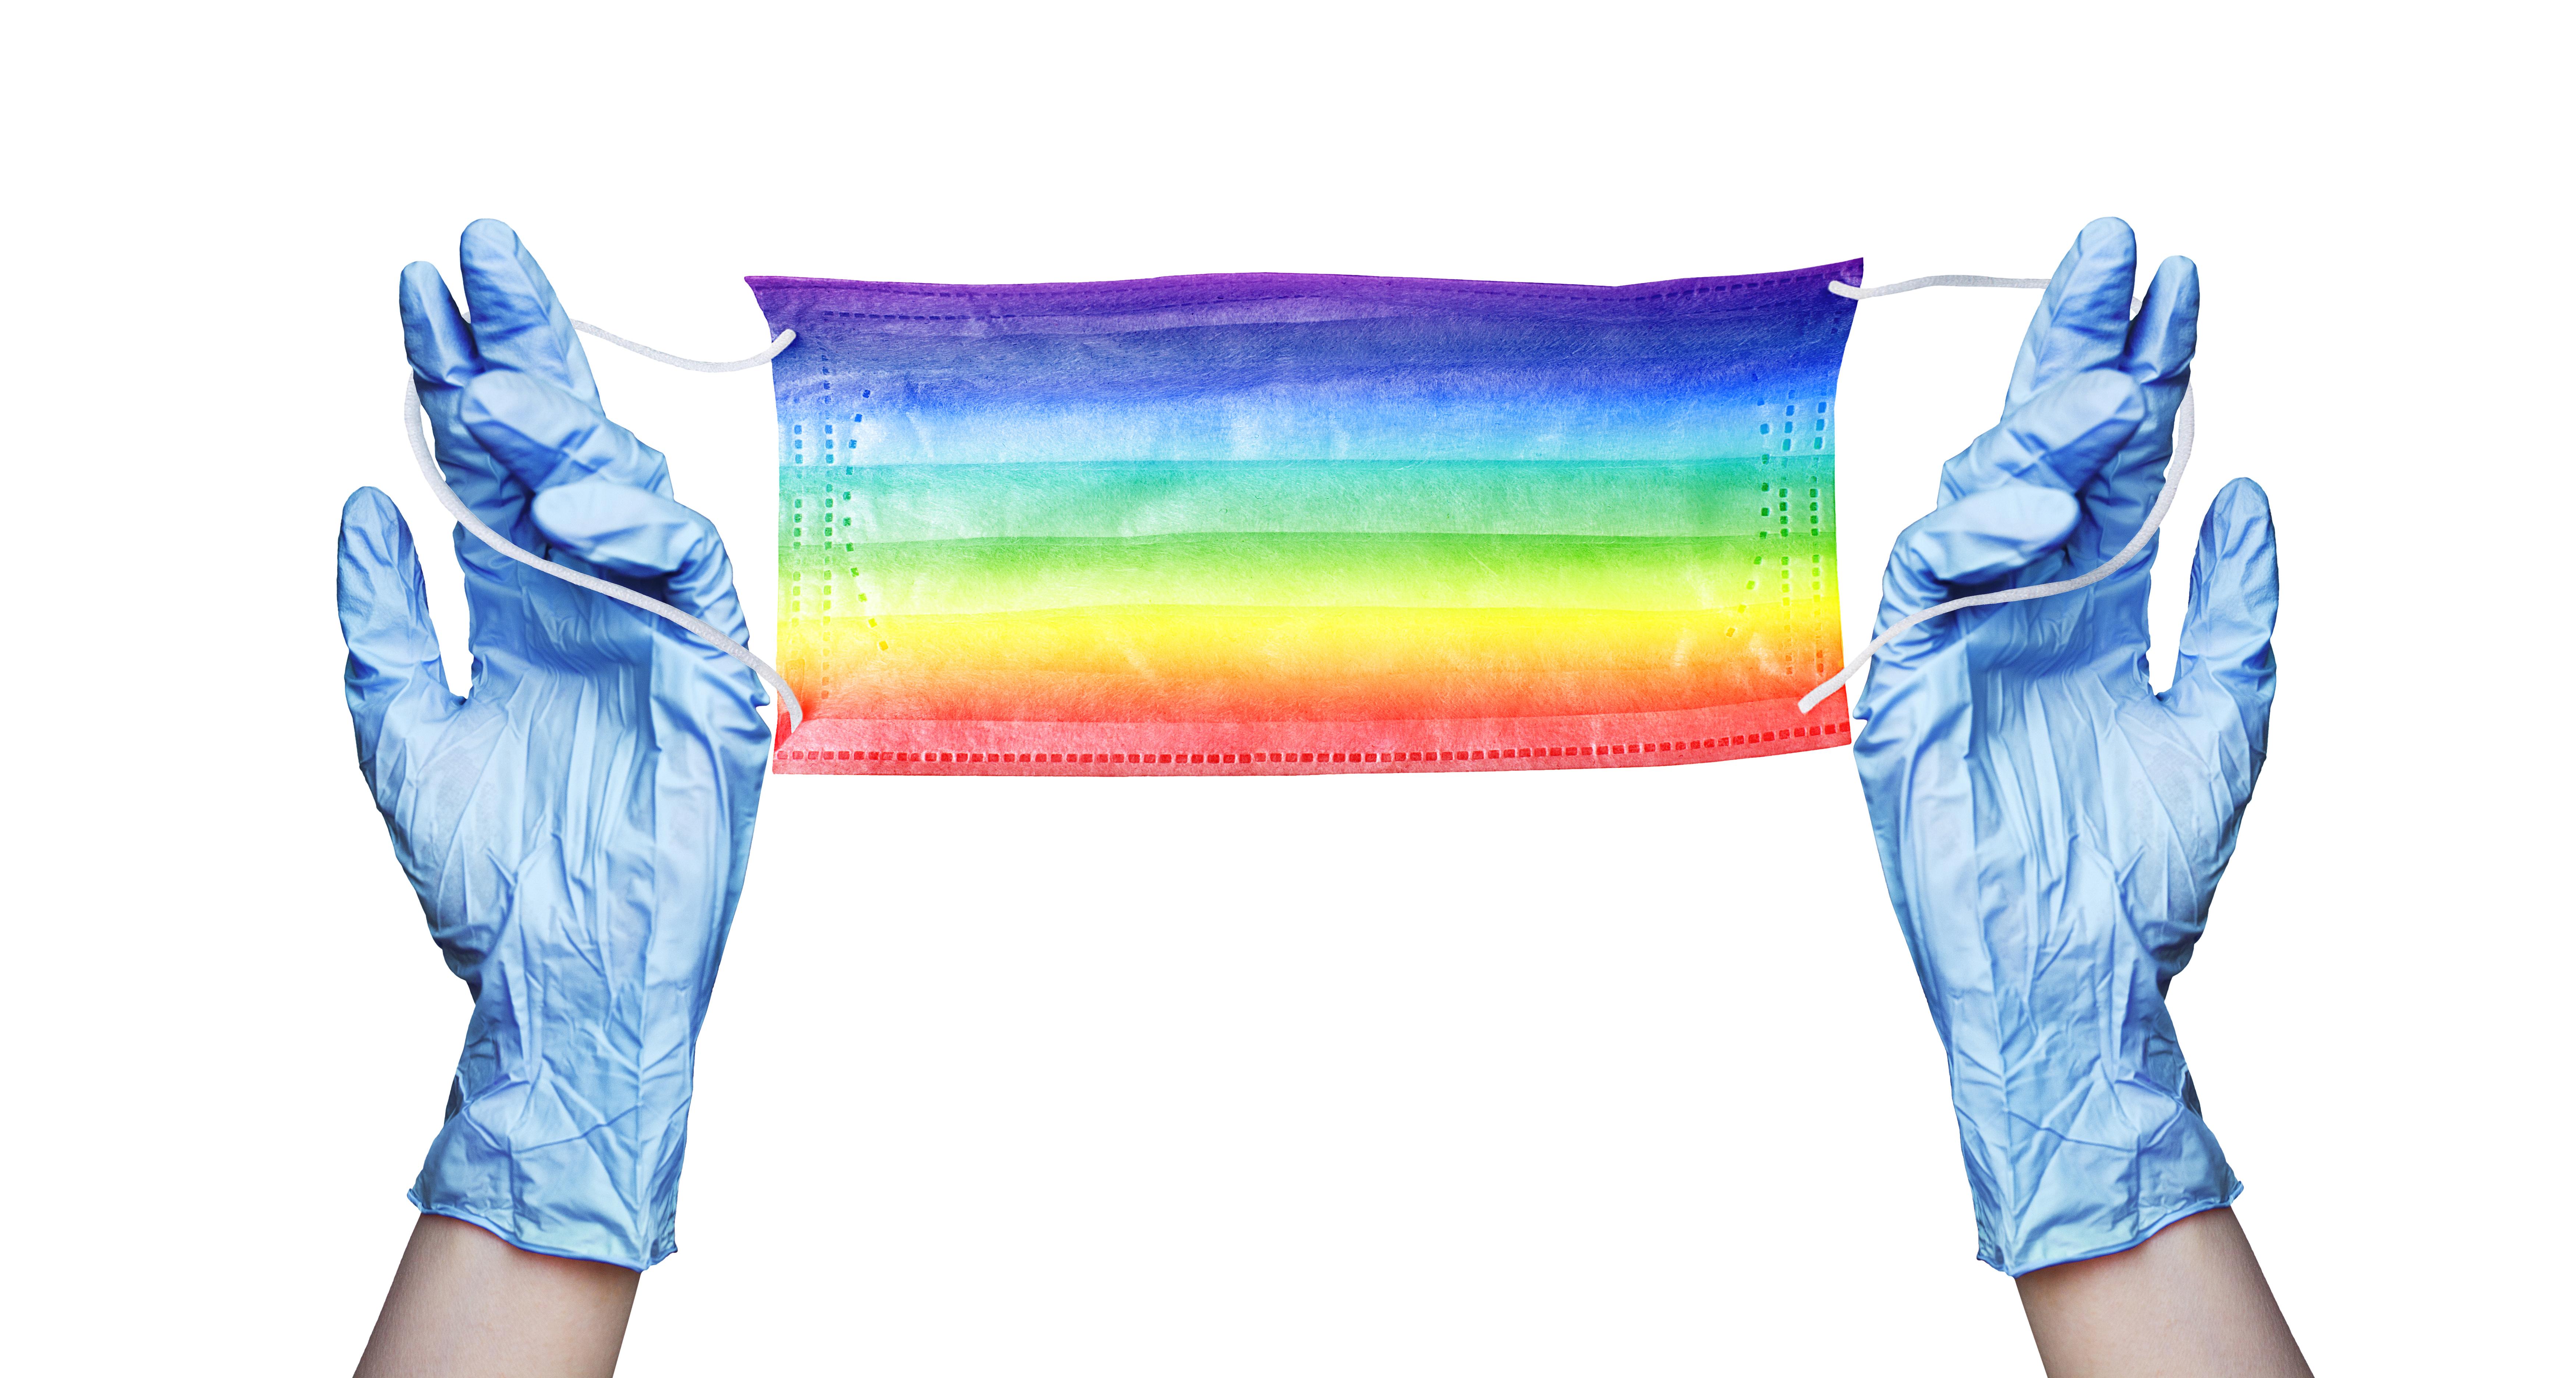 LGTBQ, patient care, healthcare, inclusive care, lesbian, bi, gay, trans, queer